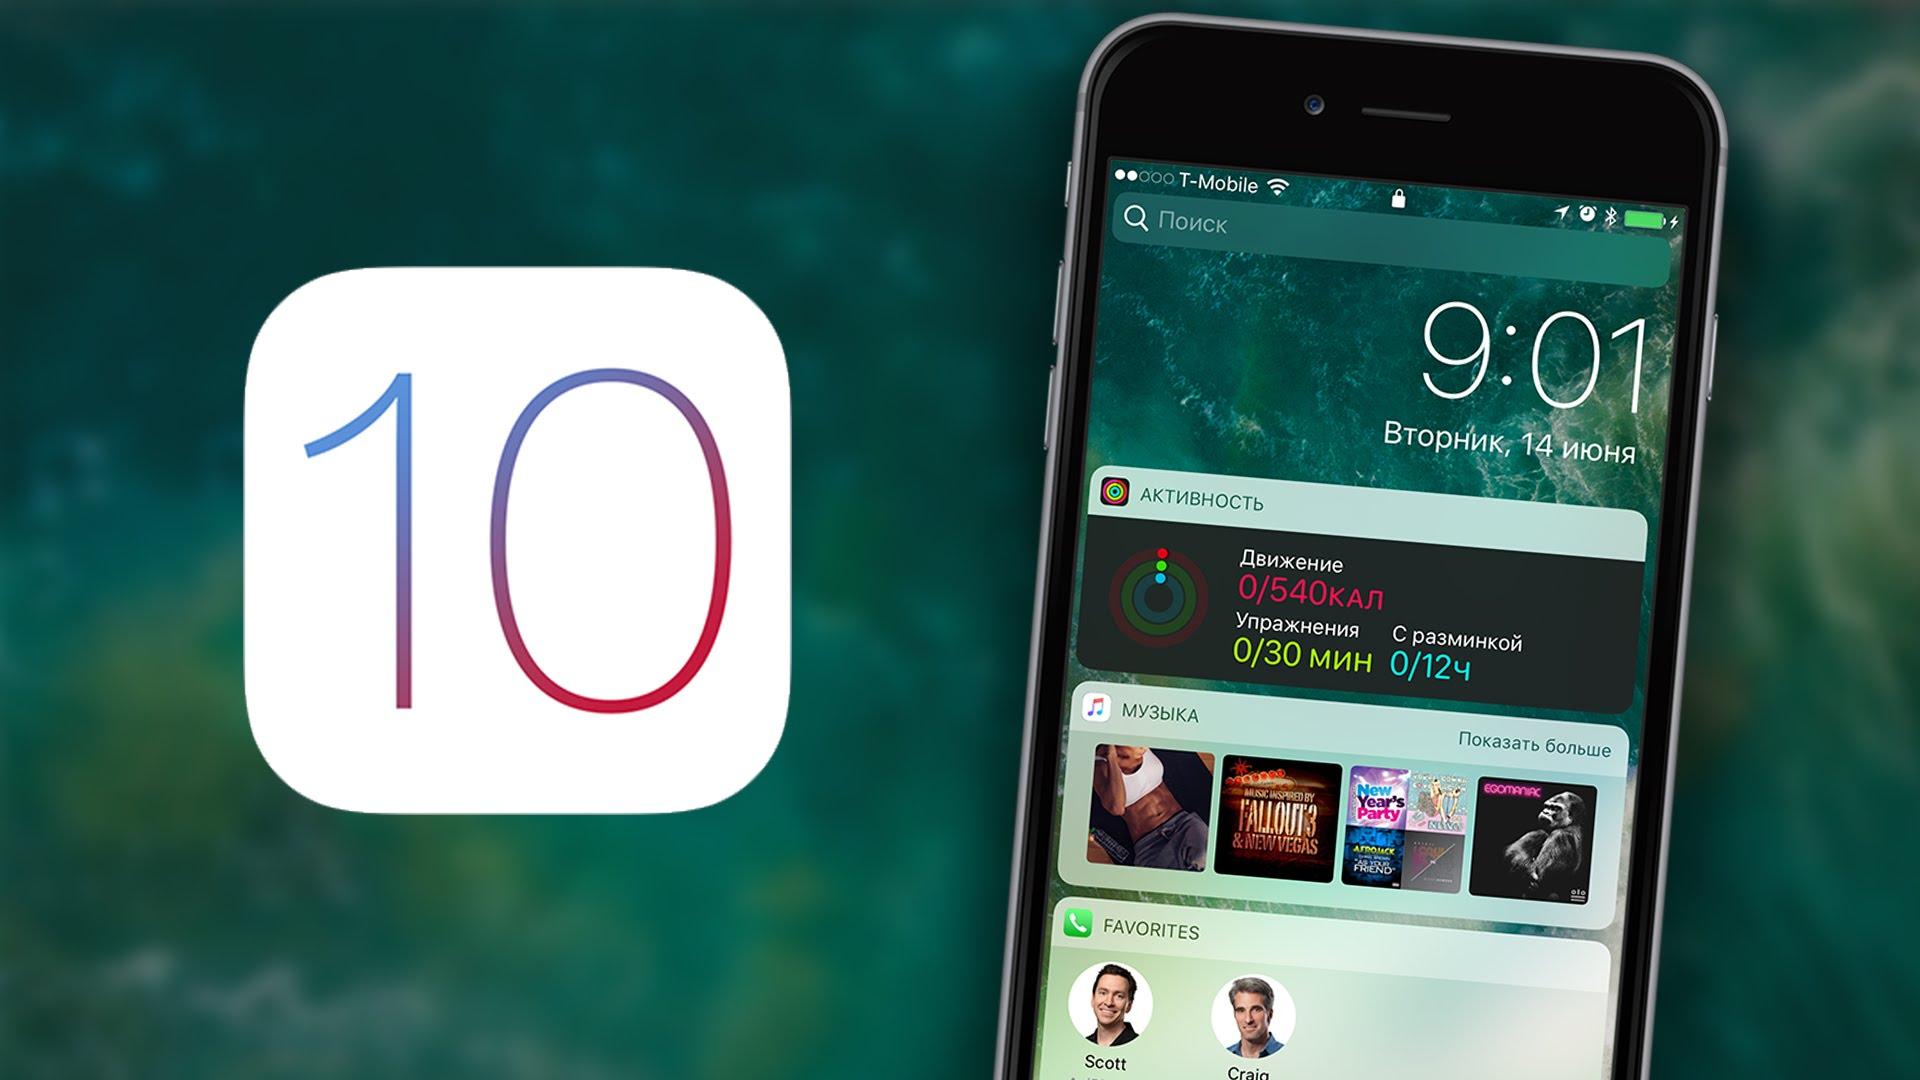 IOS 10.2.1 ha una brutta sorpresa per gli utenti iPhone